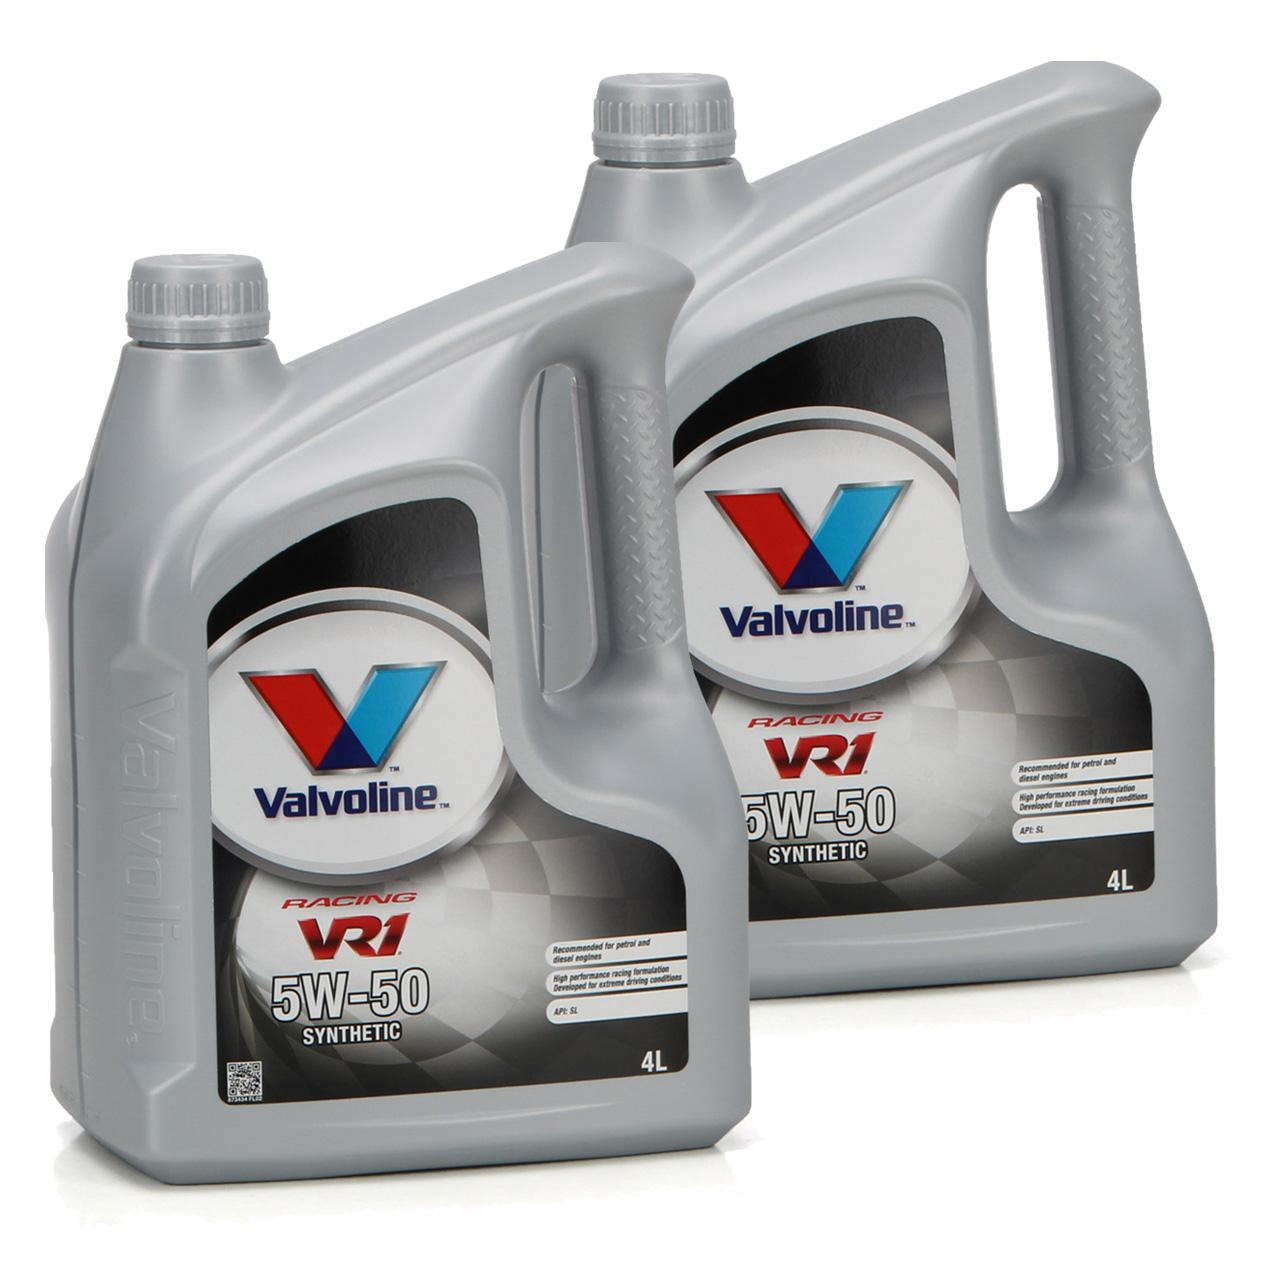 VALVOLINE Motoröl ÖL VR1 RACING 5W50 SM A3/B4 Ford M2C-153E GM 6094M - 8 Liter